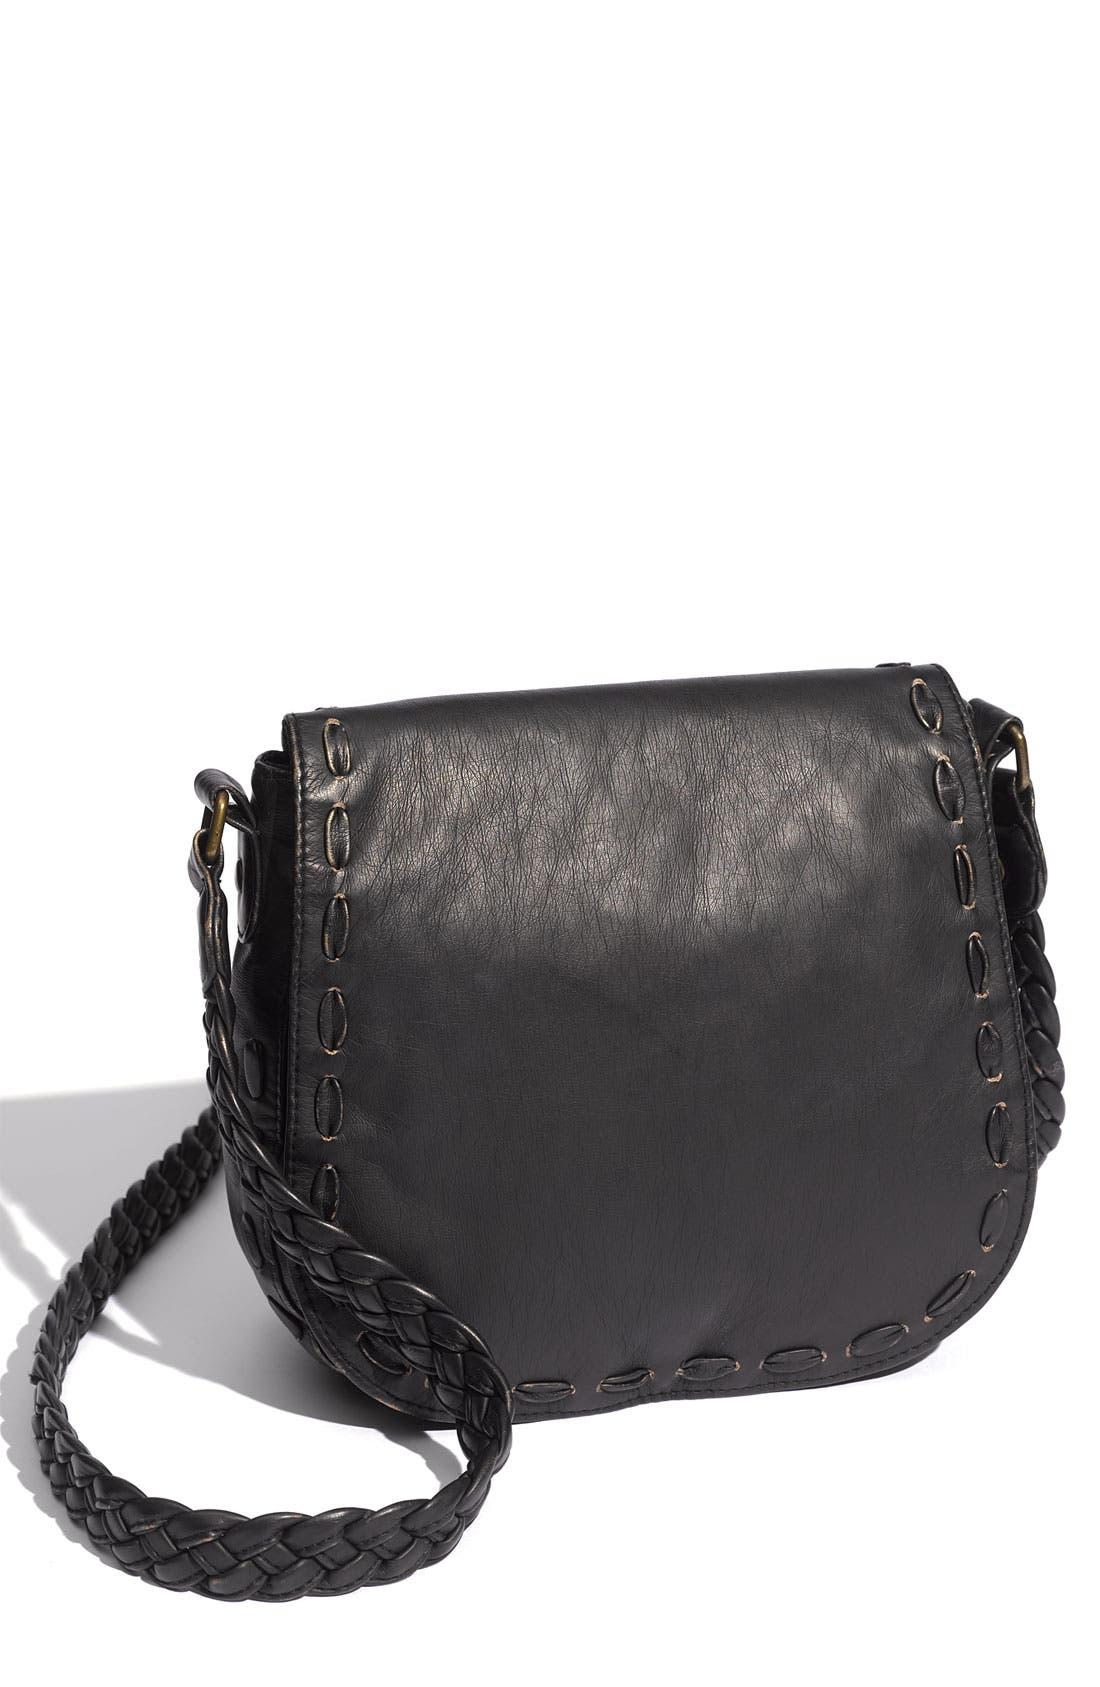 Alternate Image 1 Selected - Lulu Braided Strap Crossbody Bag